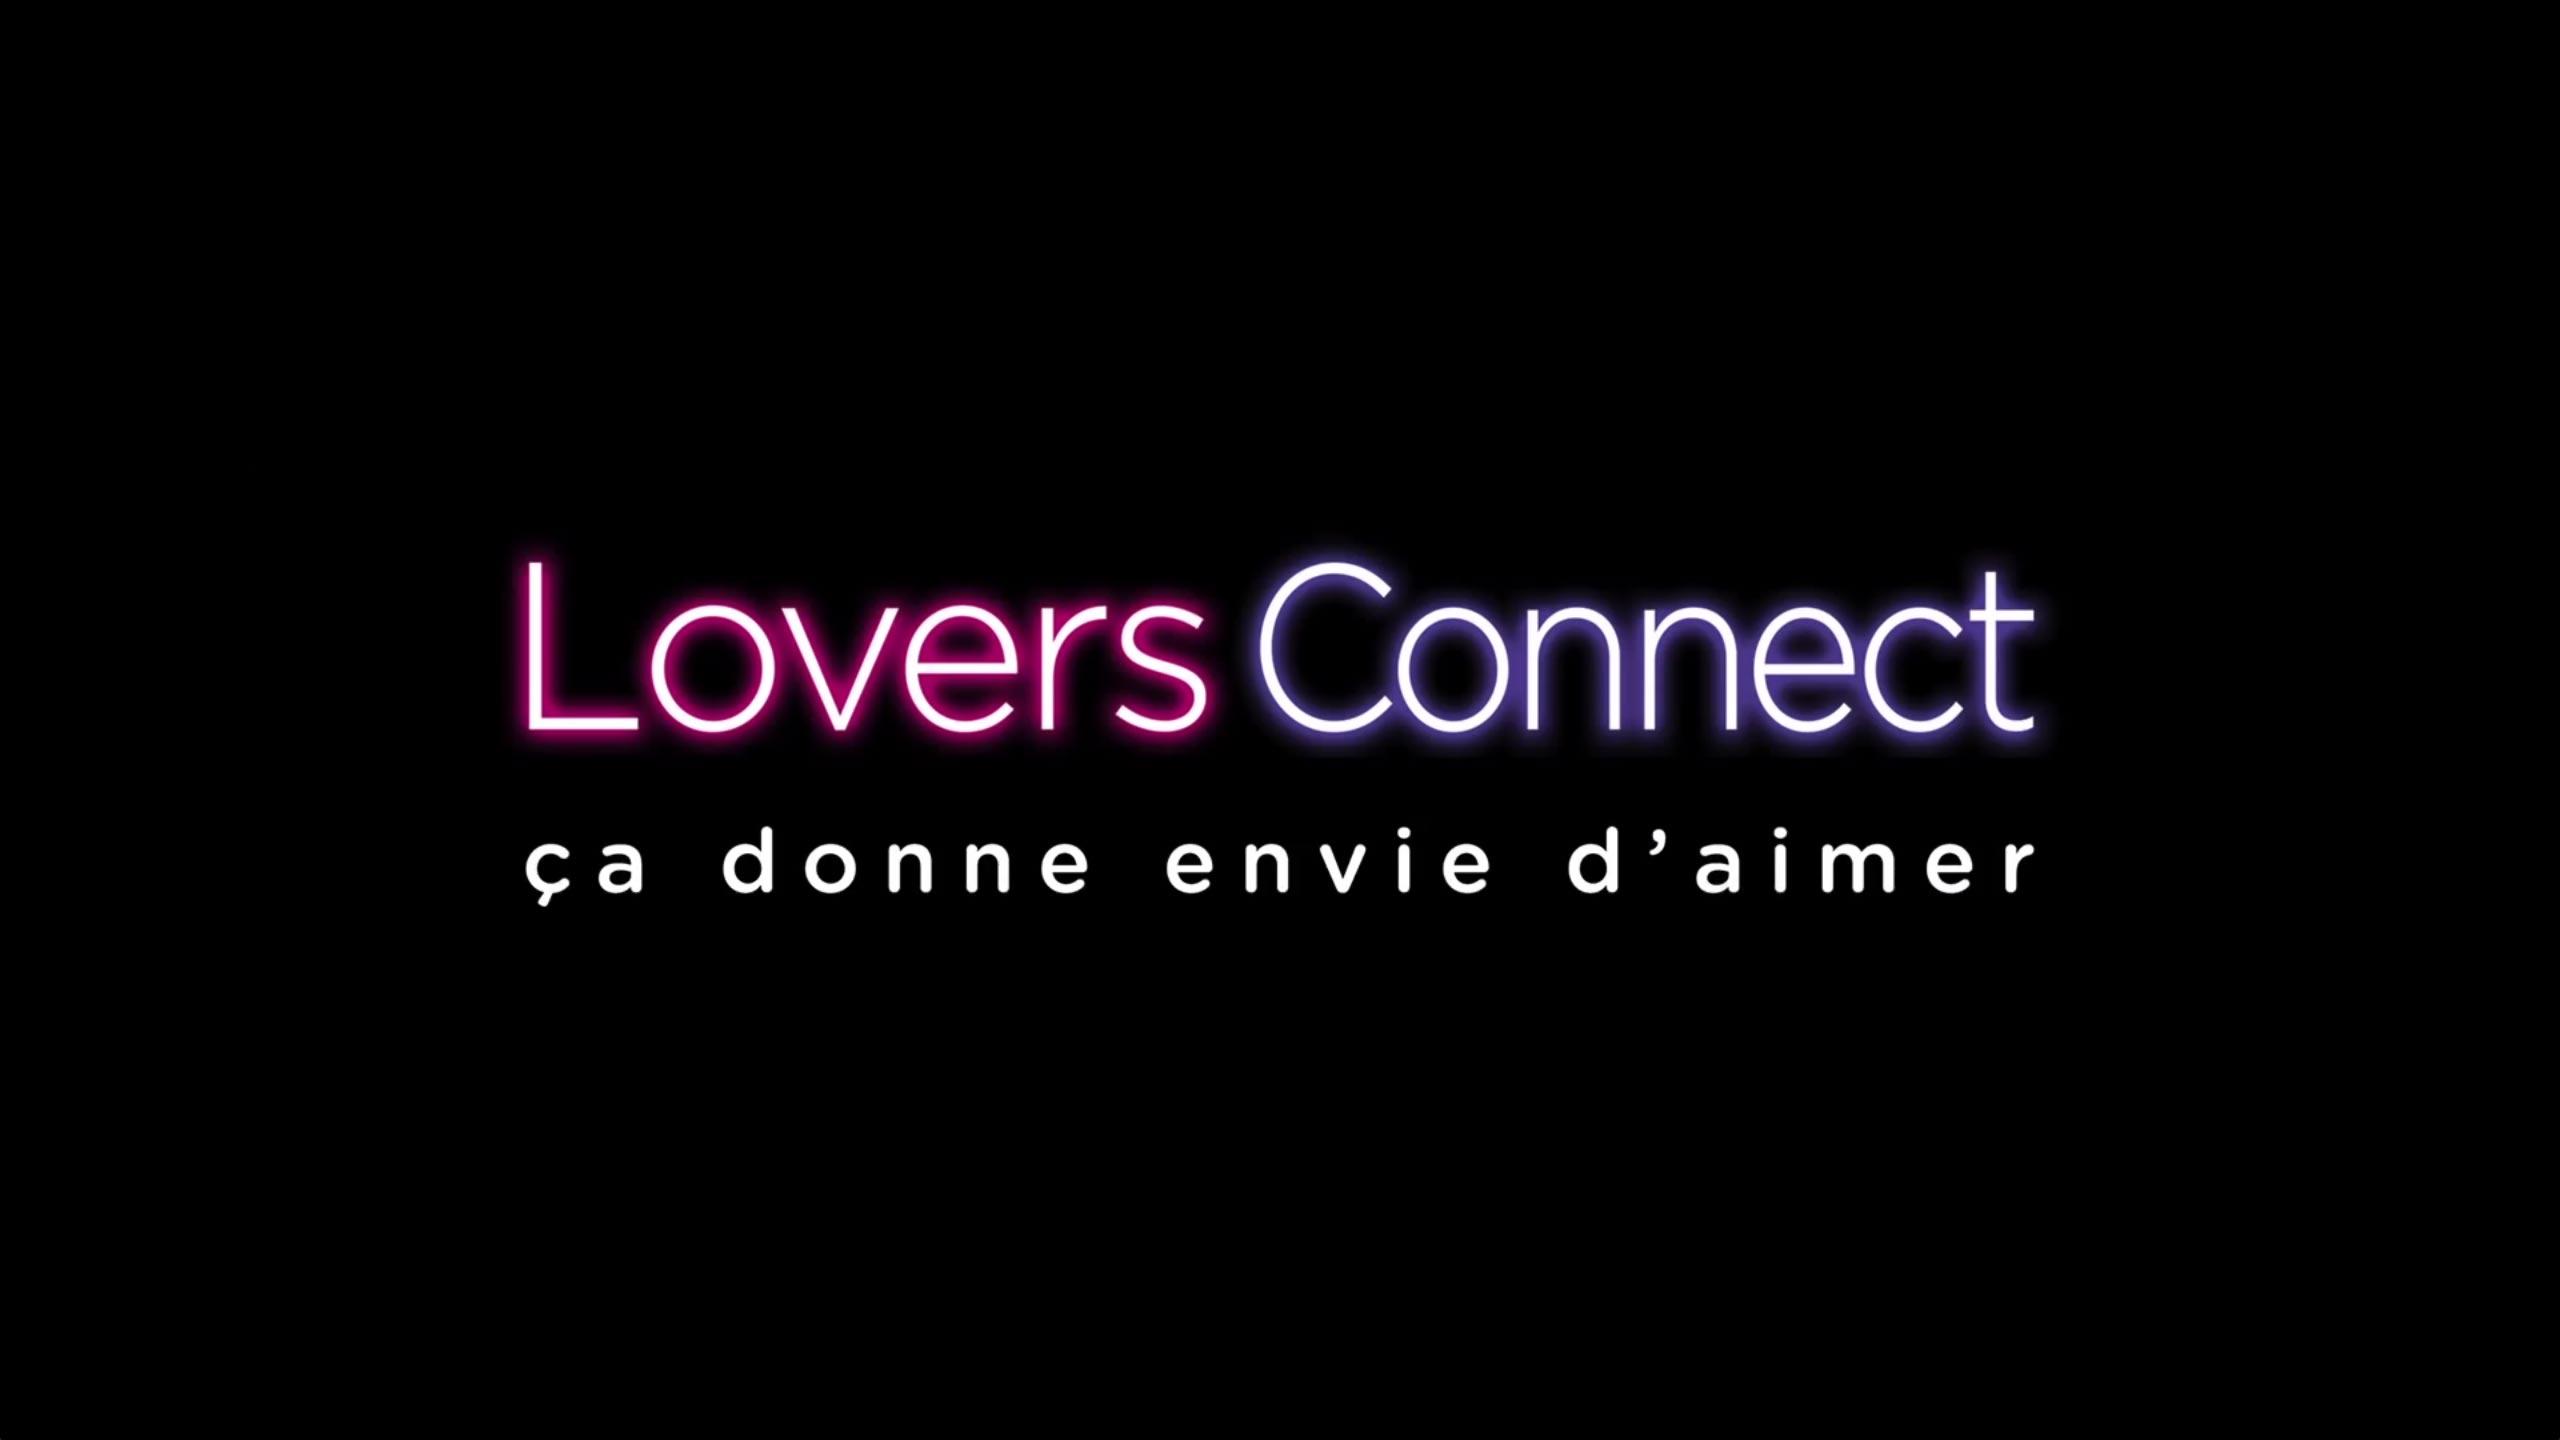 DUREX_Ça donne envie d'aimer